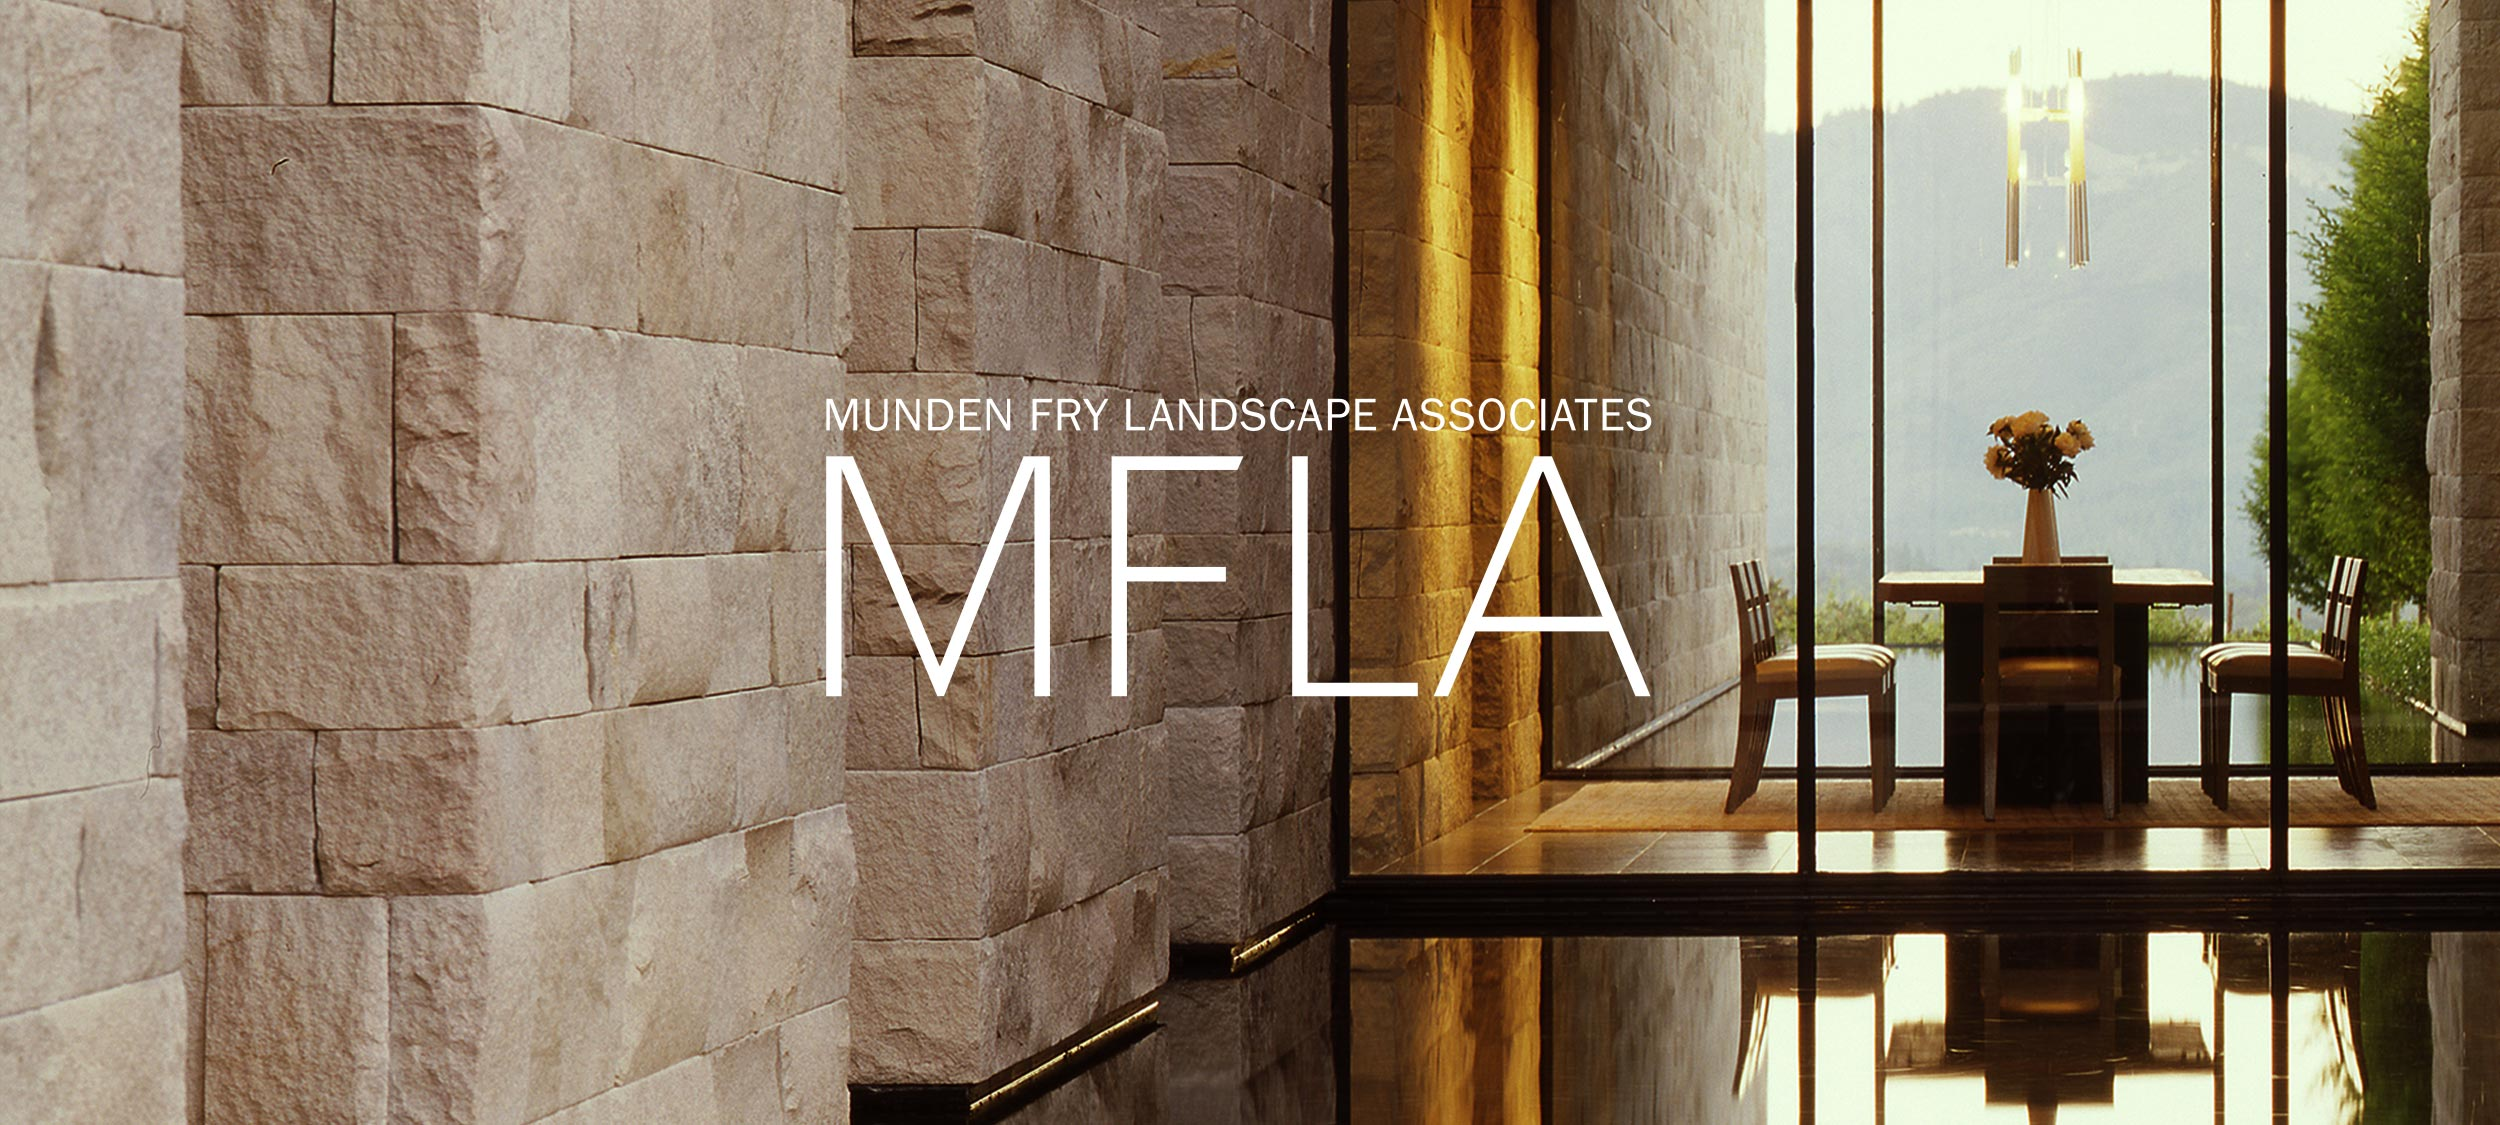 MFLA-Home-Gallery-06.jpg